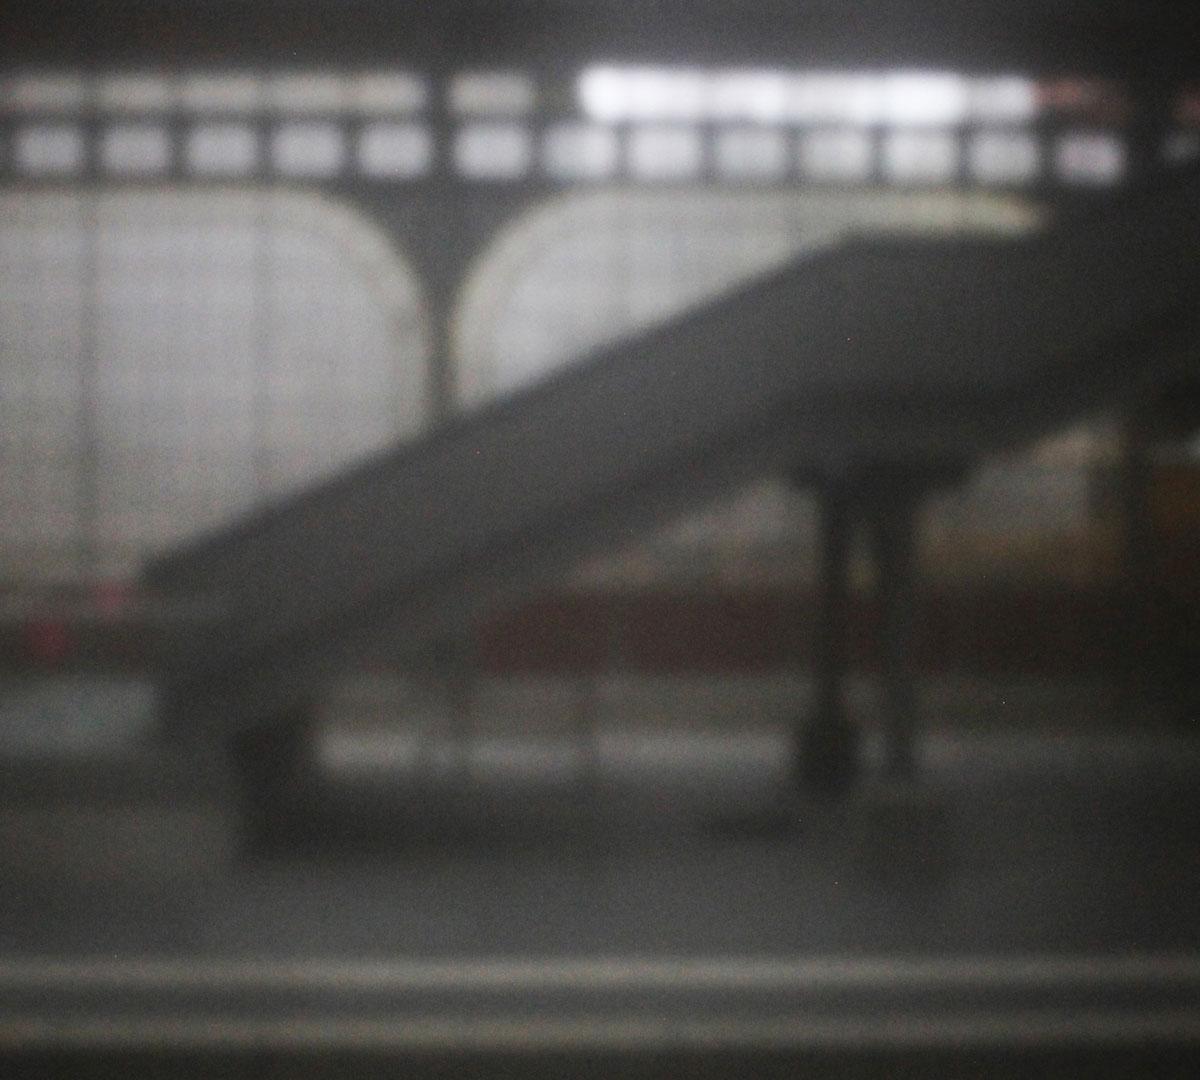 03 | Bahnhof Lübeck | 2021 | Camera Obscura | Pigmentdruck Alu-Dibond